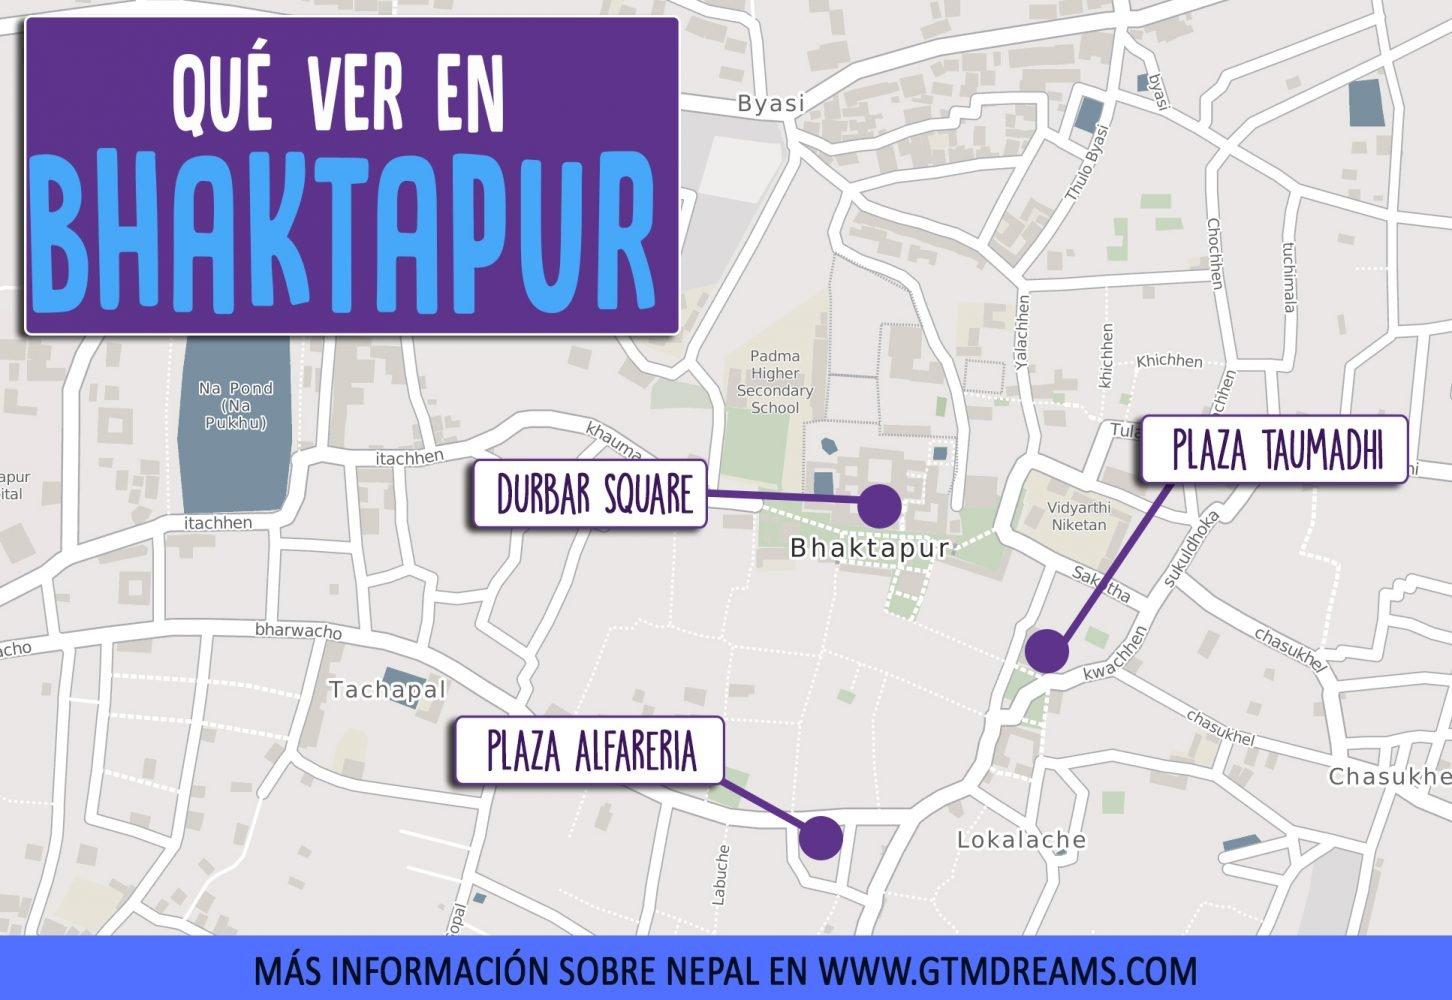 mapa de Bhaktapur. Que ver en Bhaktapur